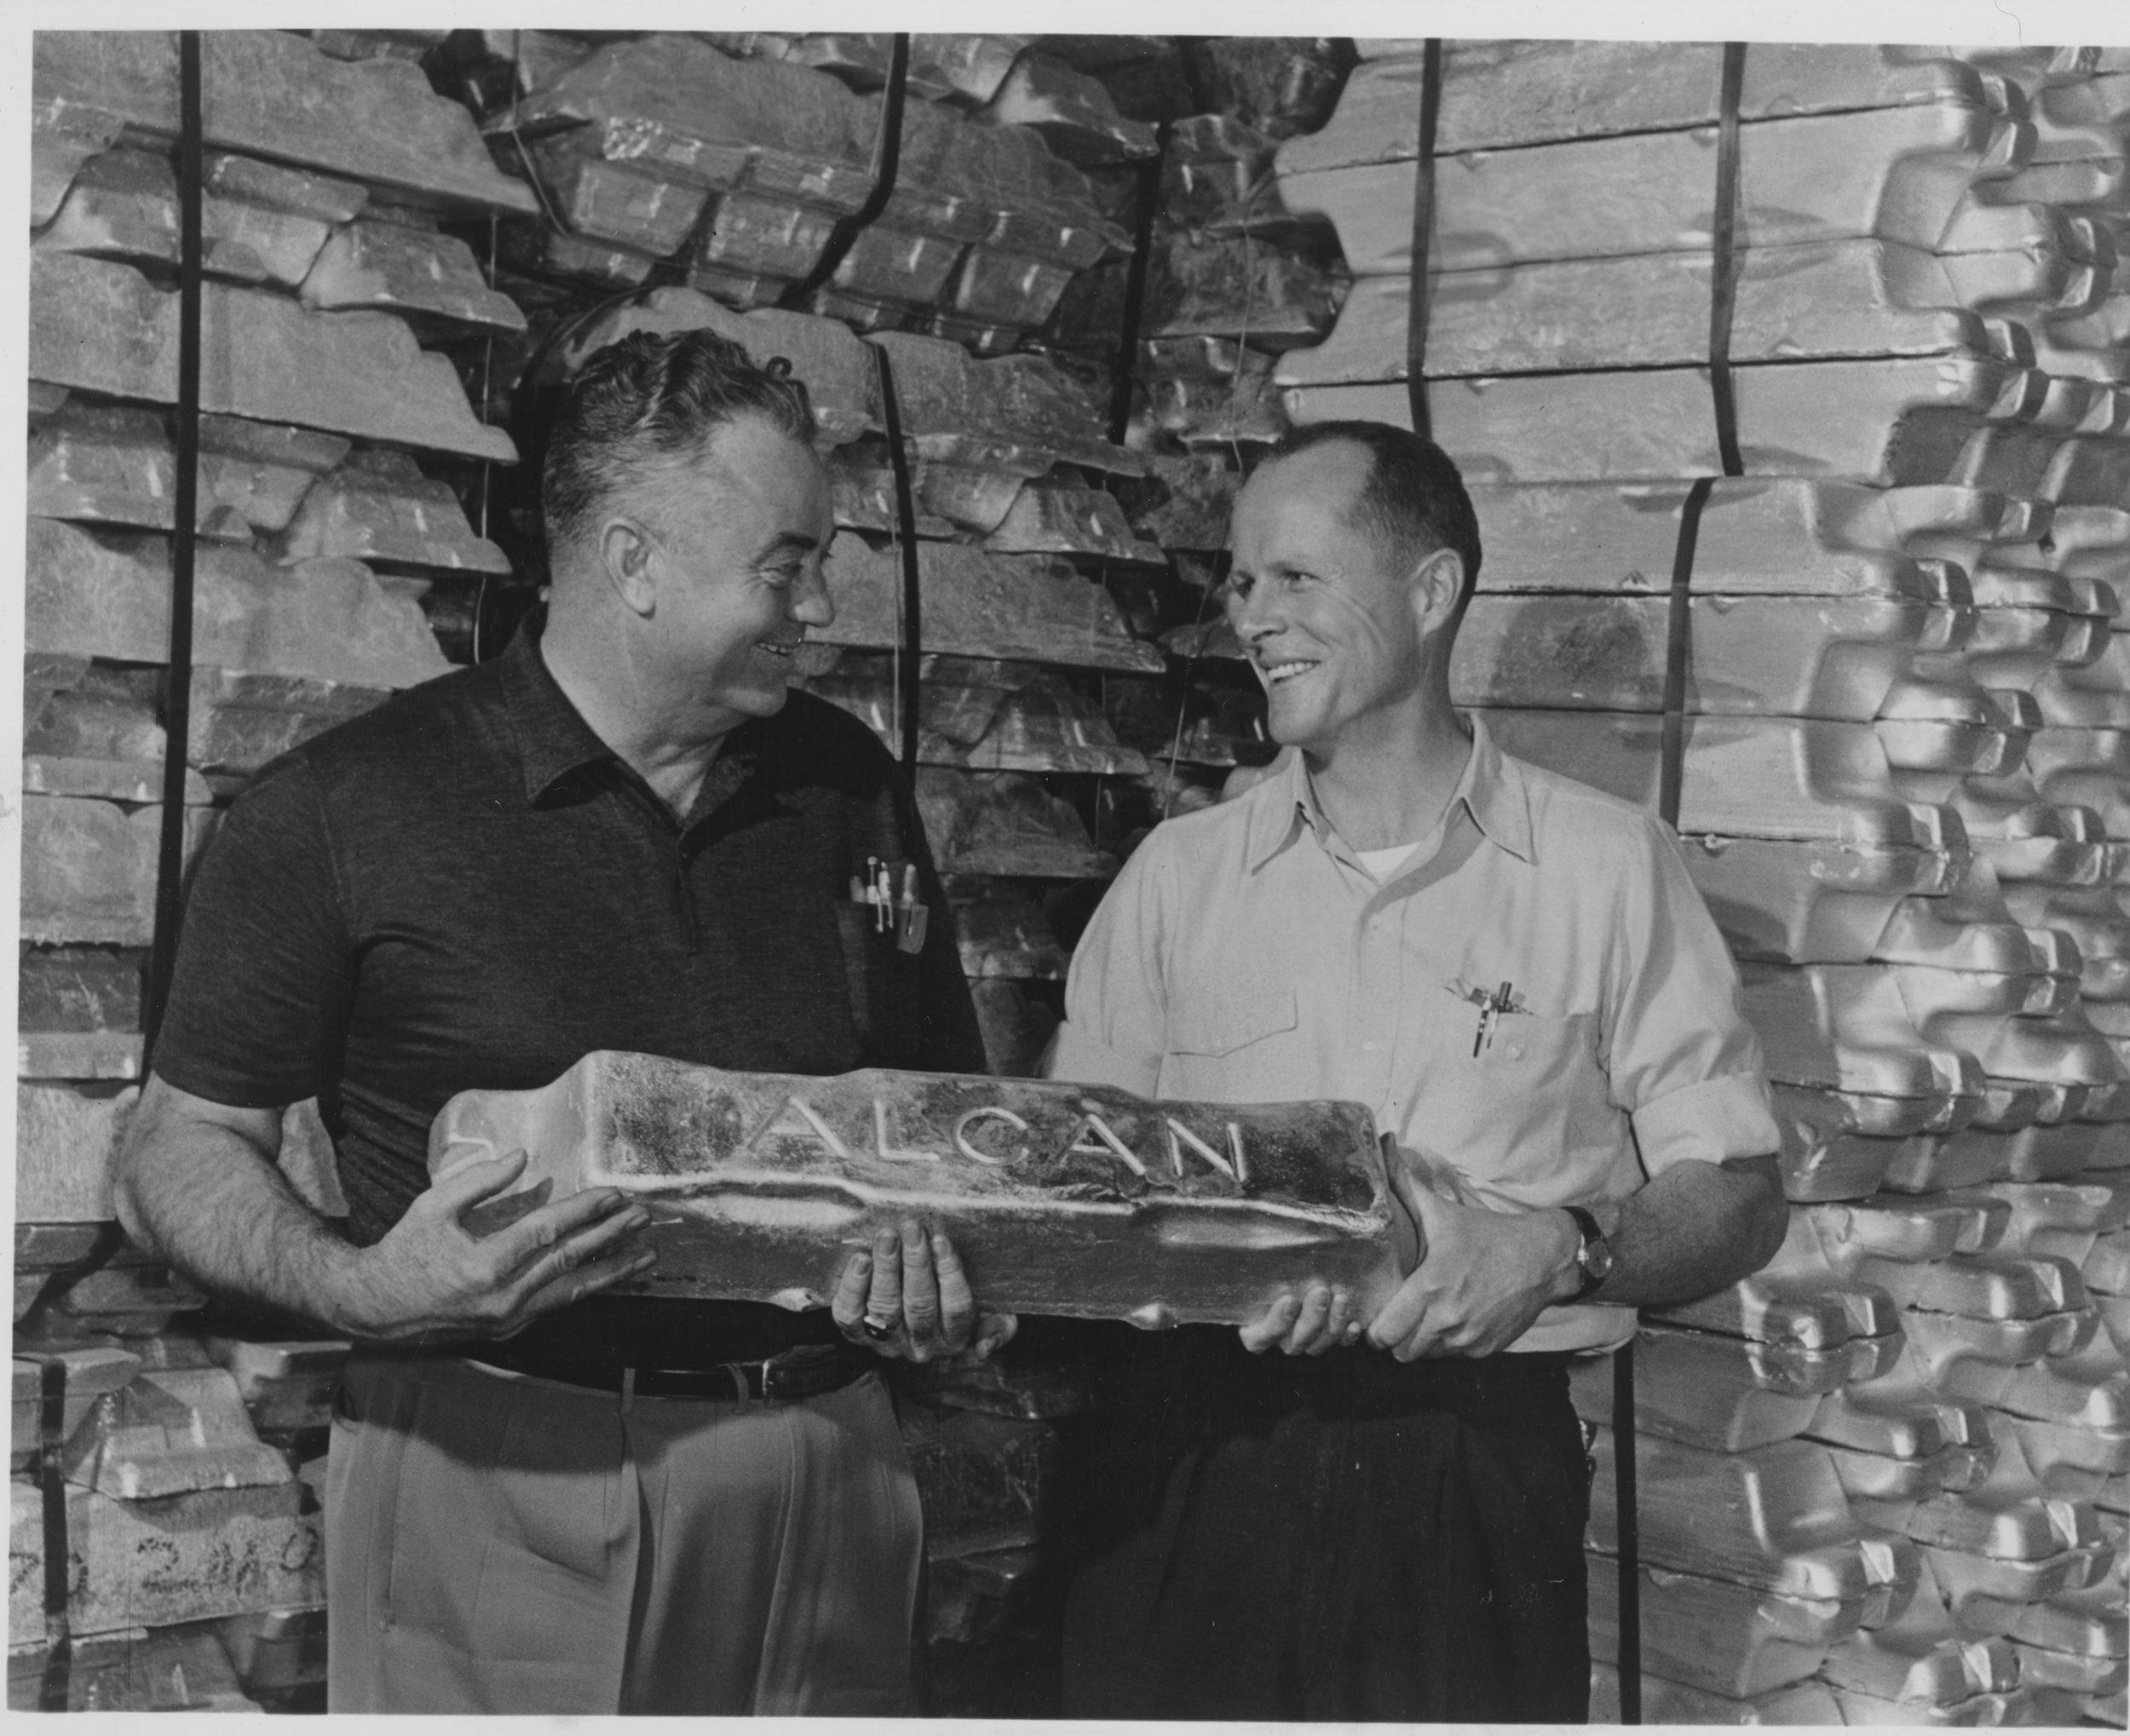 Bill and Bob Mornin – circa 1960s